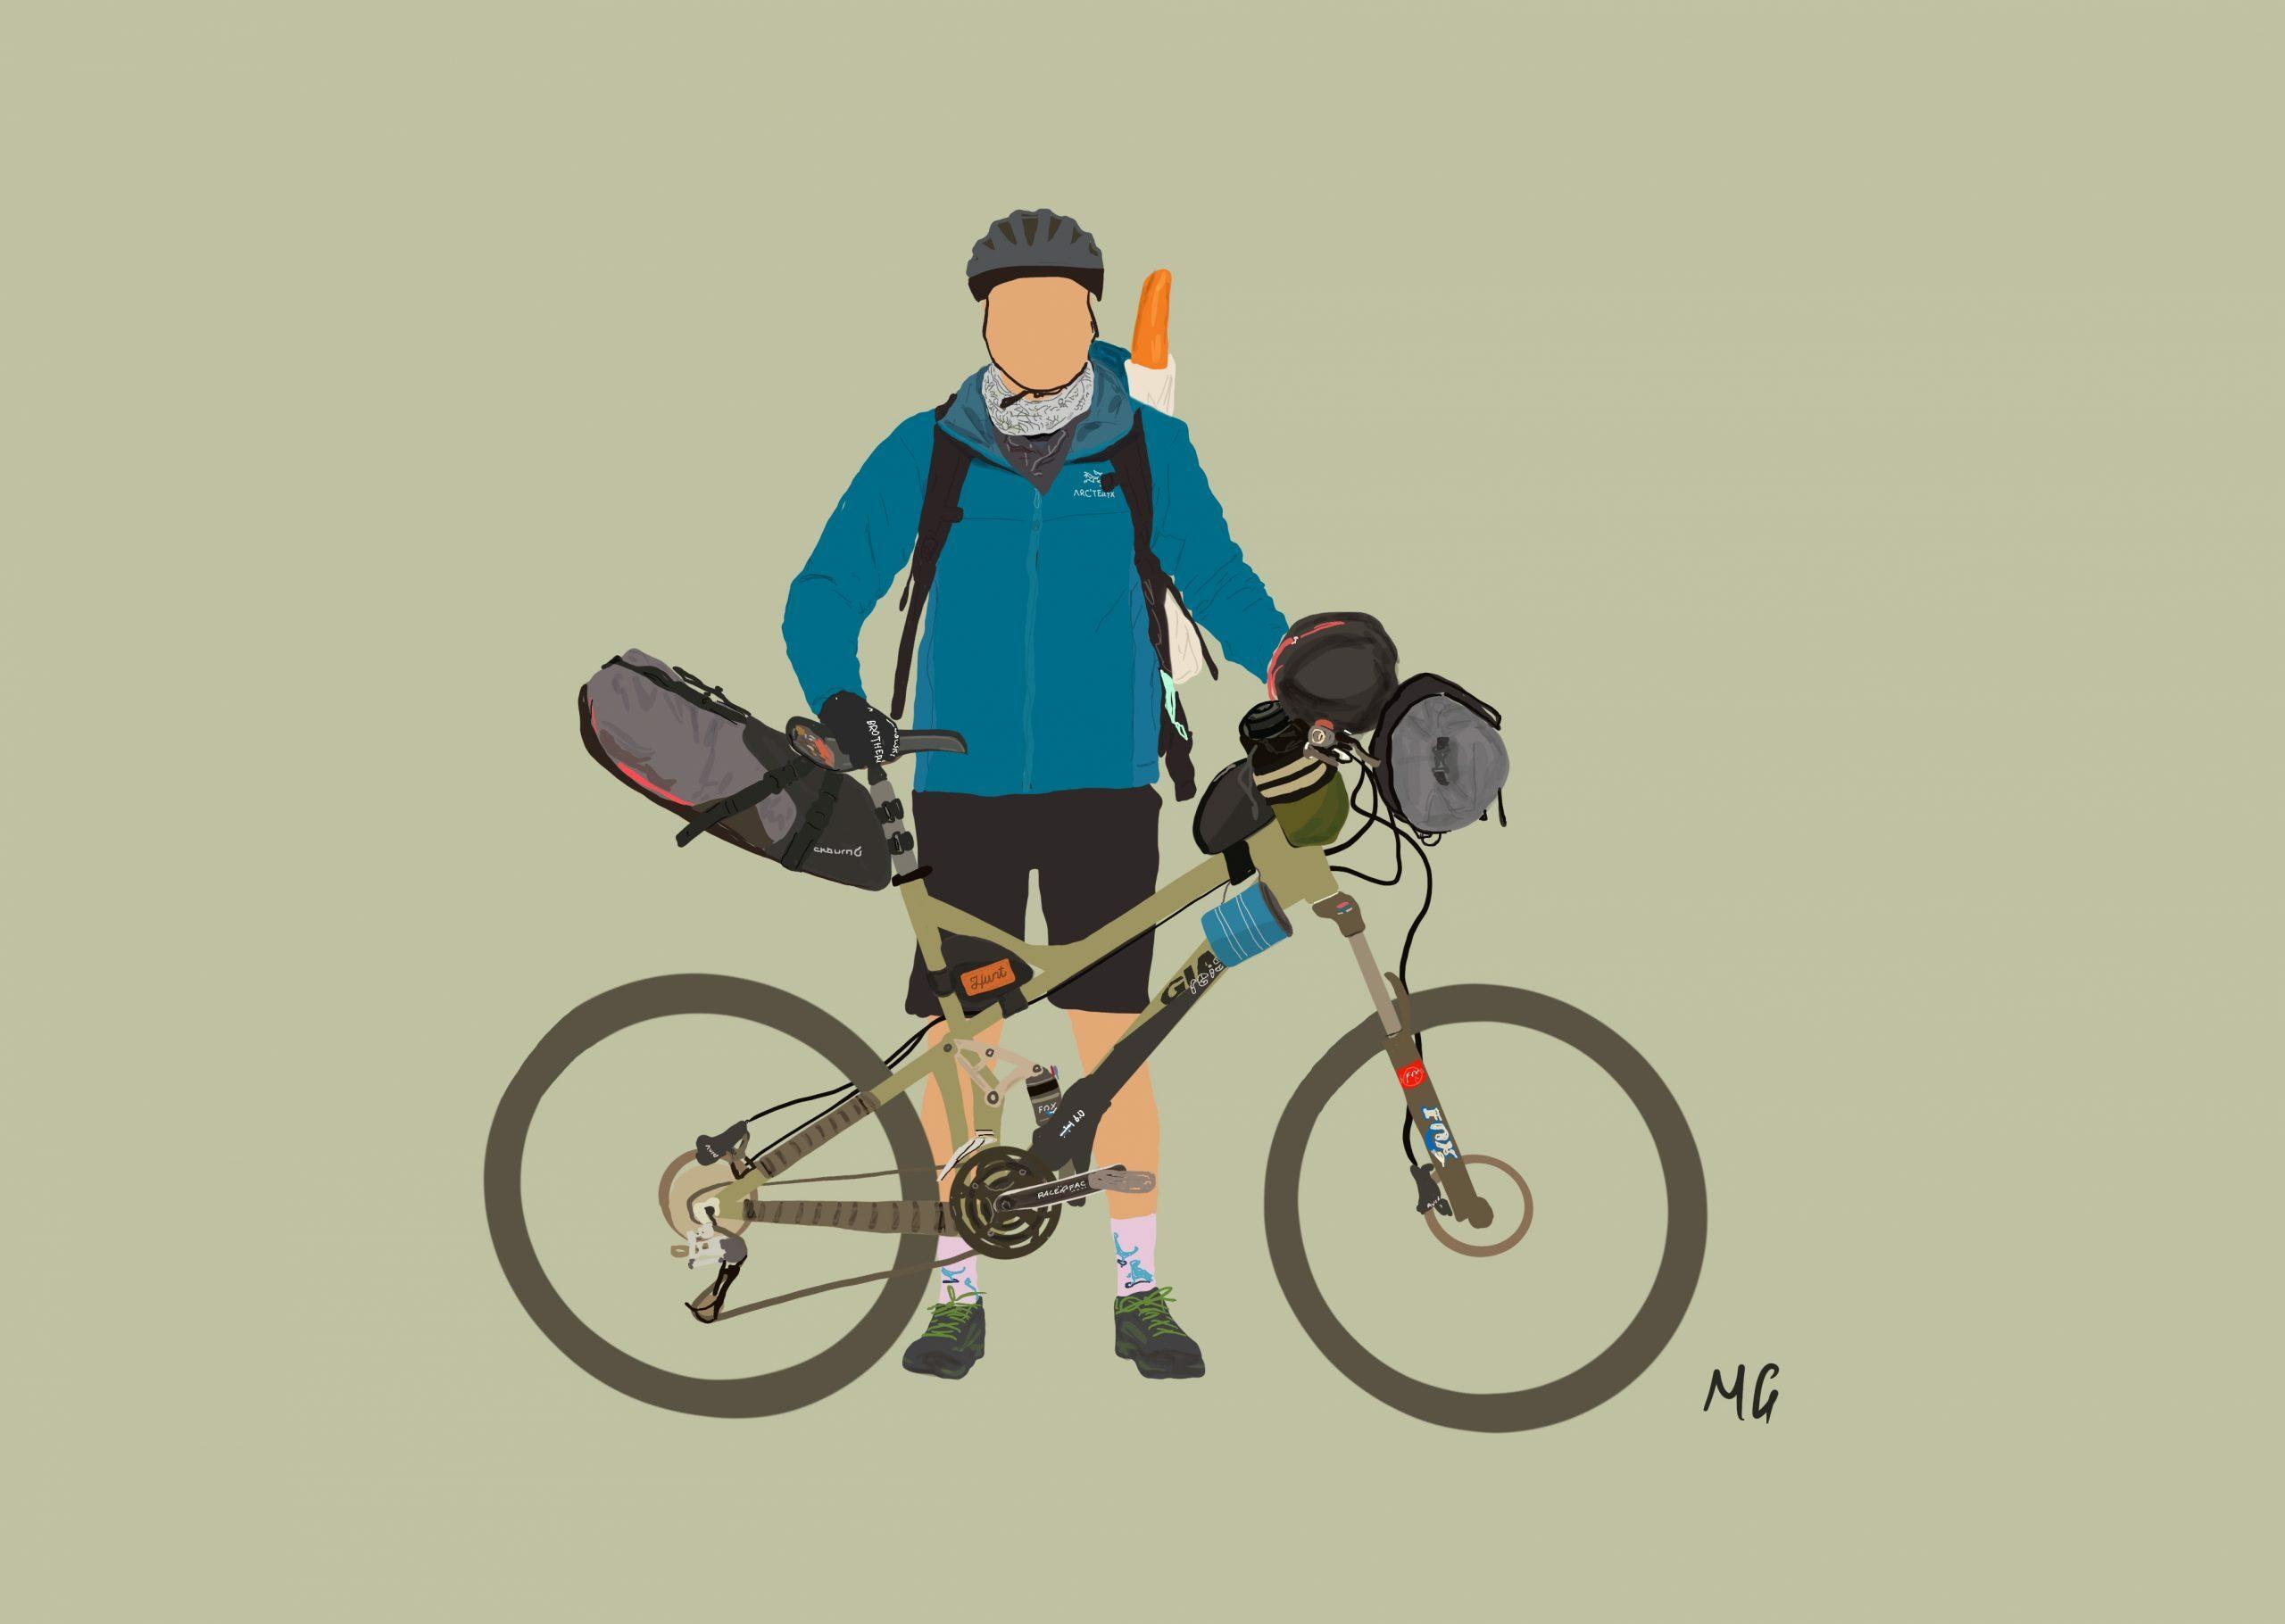 Tim Ashelford, editor of We Are Explorers - @Mattiedrawsbikes Mattie draws bikes bikepacking illustrations using procreate